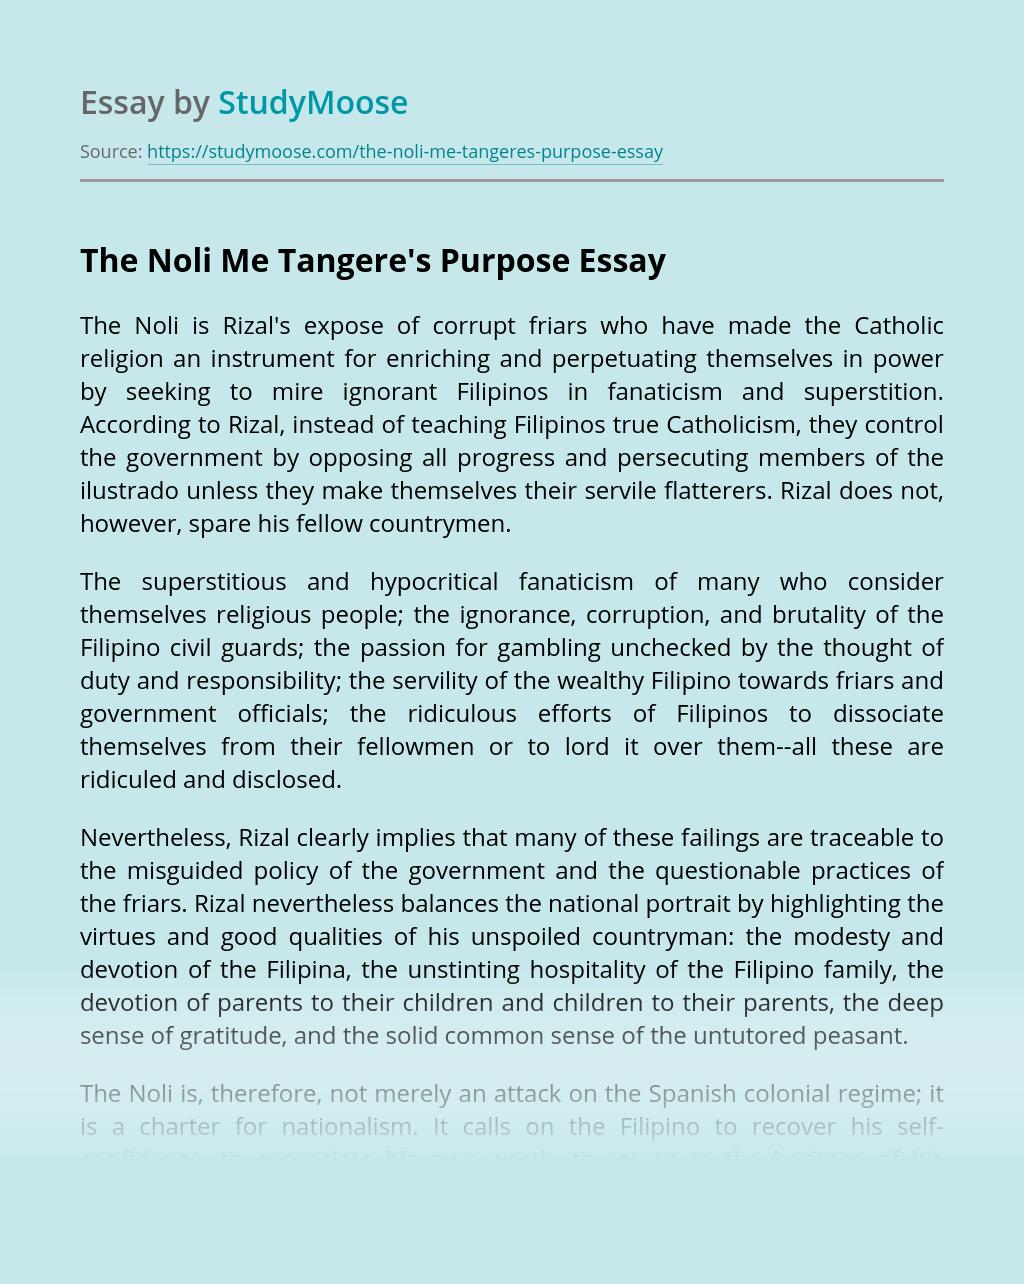 The Noli Me Tangere's Purpose